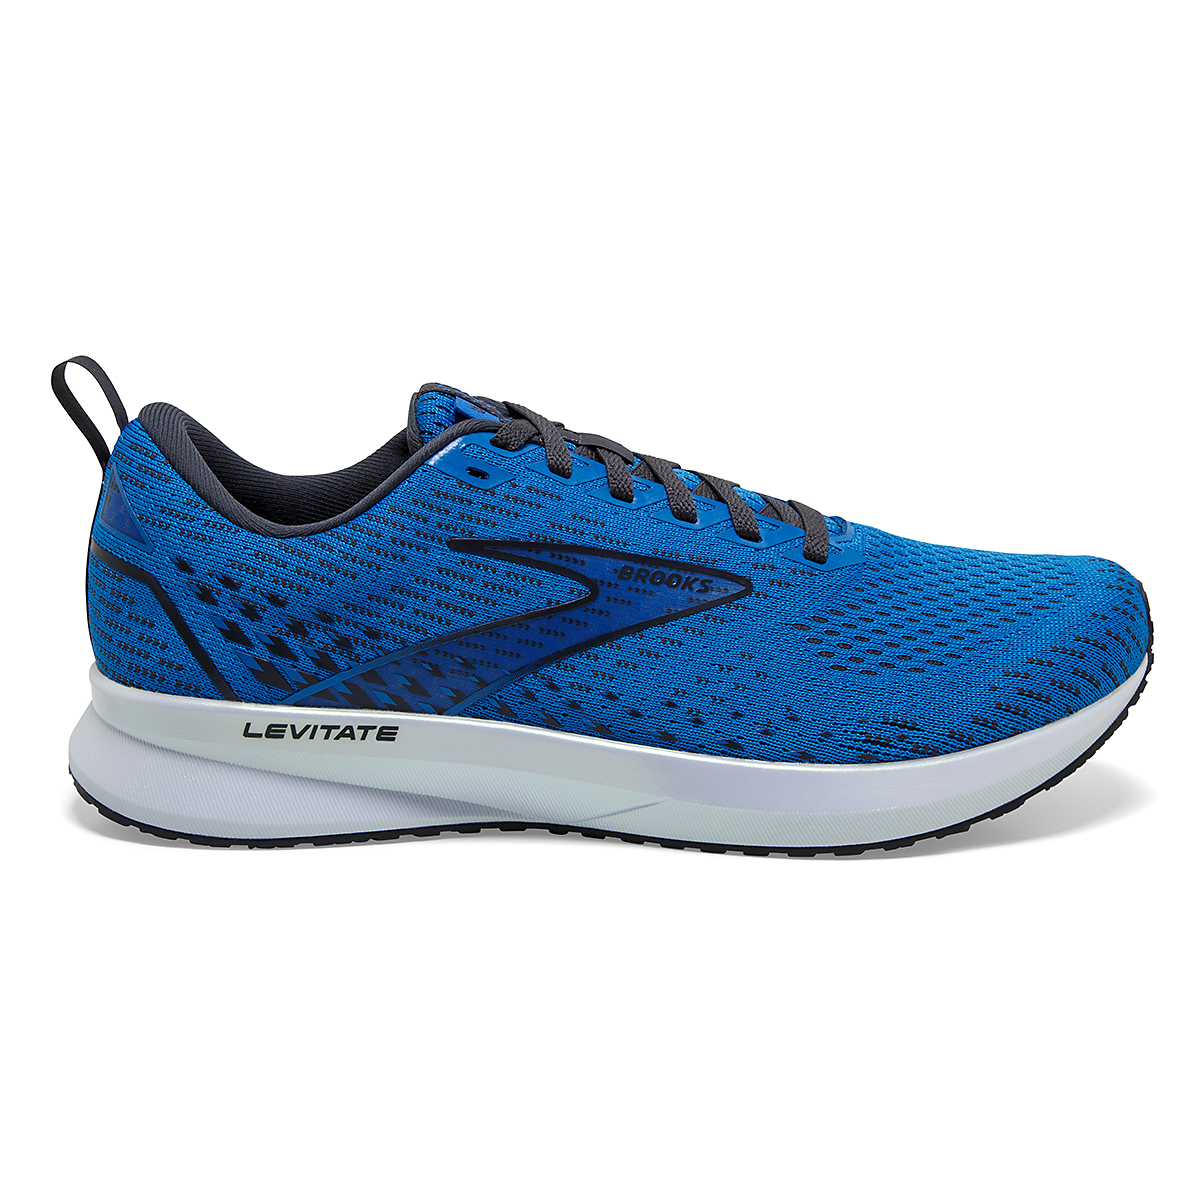 Men's Brooks Levitate 5 Running Shoe - Color: Blue/India Ink/White - Size: 7 - Width: Regular, Blue/India Ink/White, large, image 1